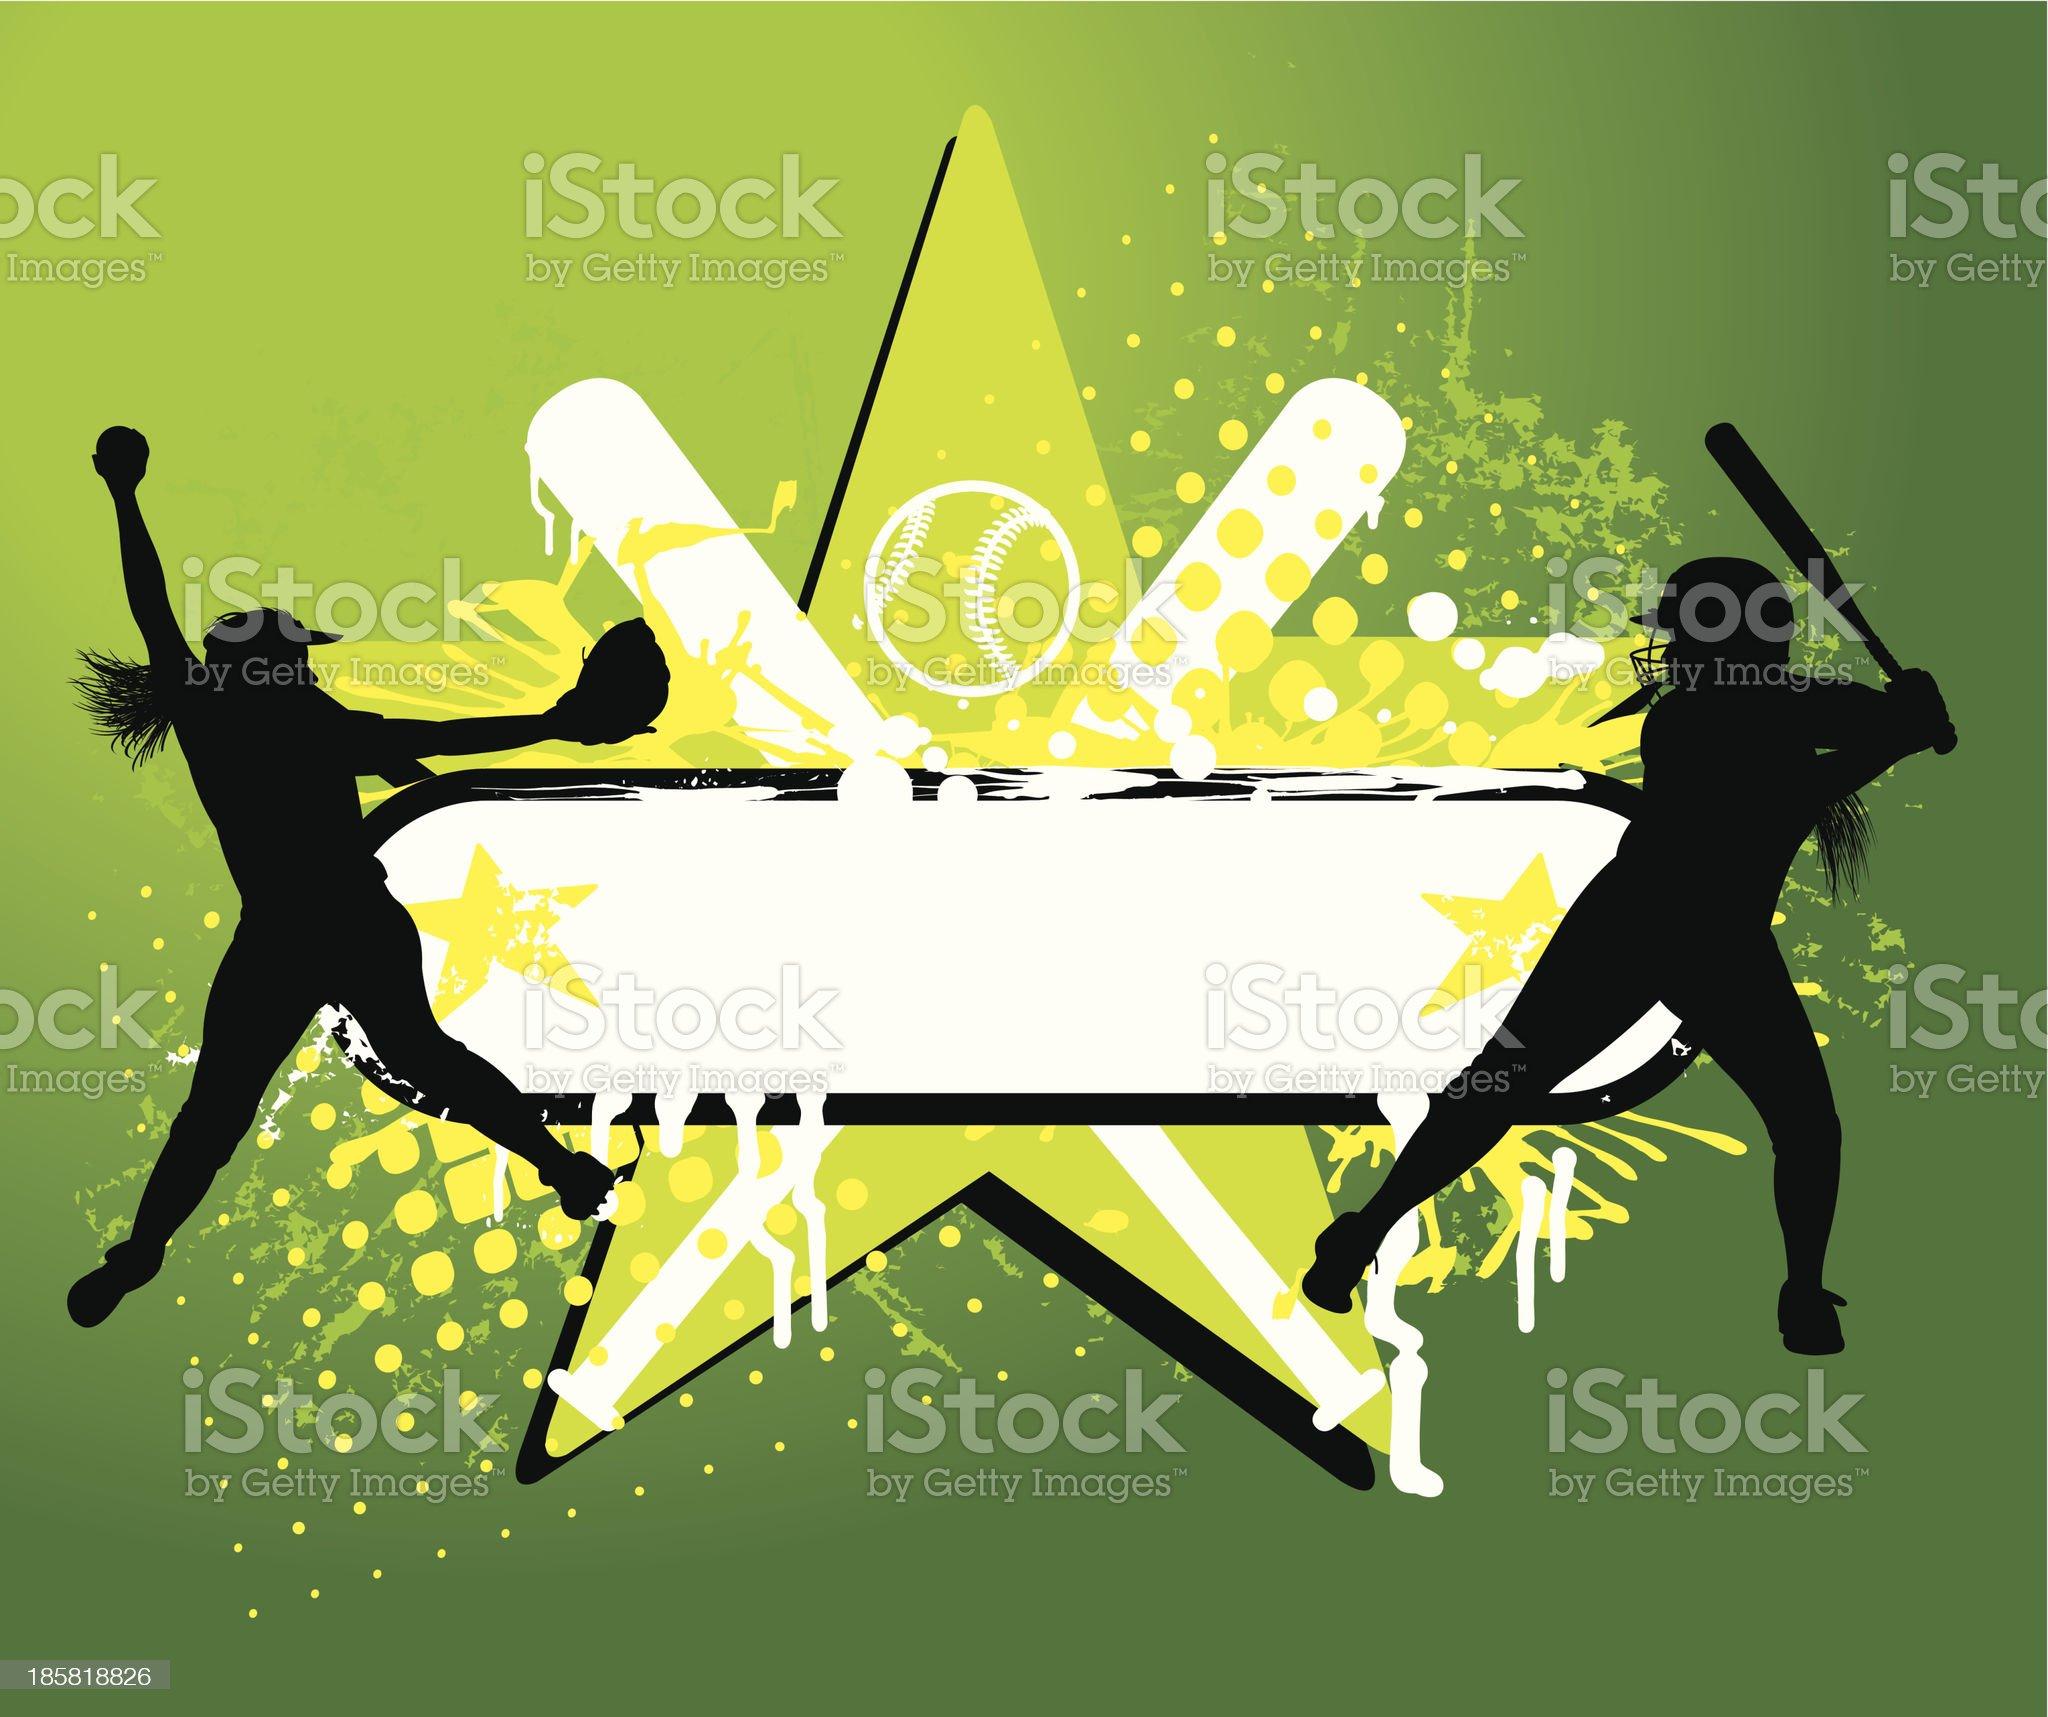 Girls Softball All-Star Grunge Background - Batter, Pitcher royalty-free stock vector art